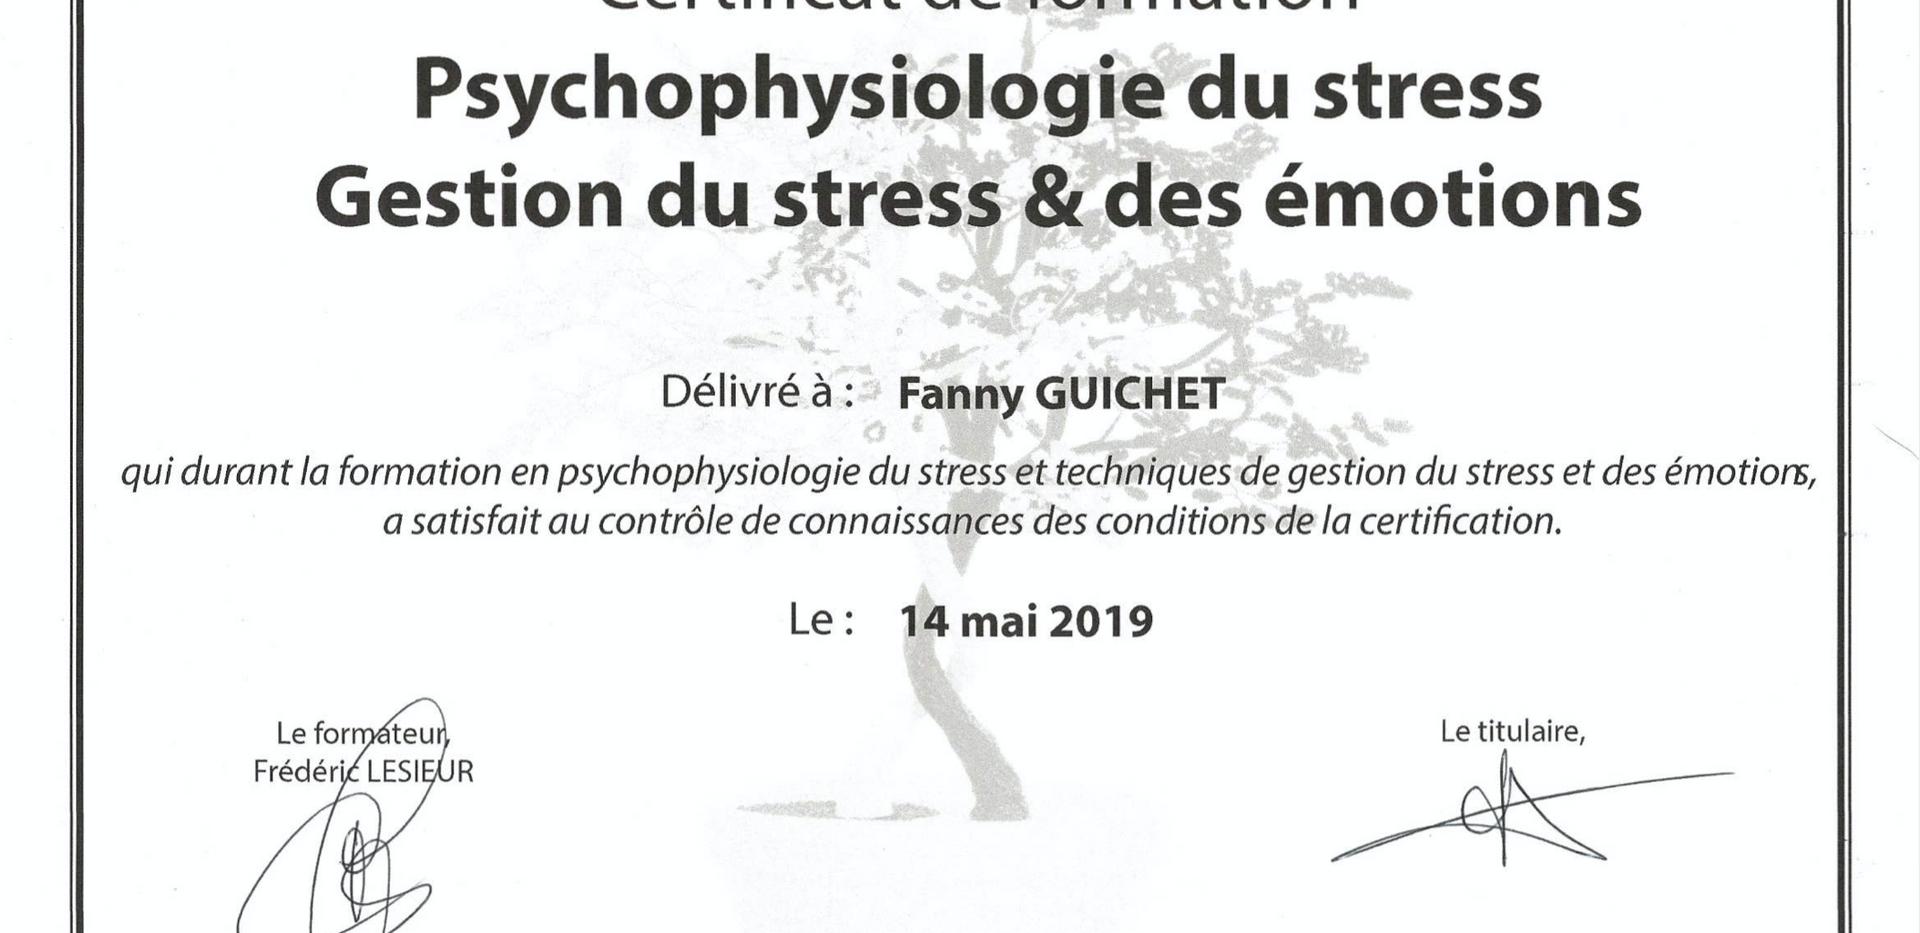 Certificat de formation Psychophysiologie du stress